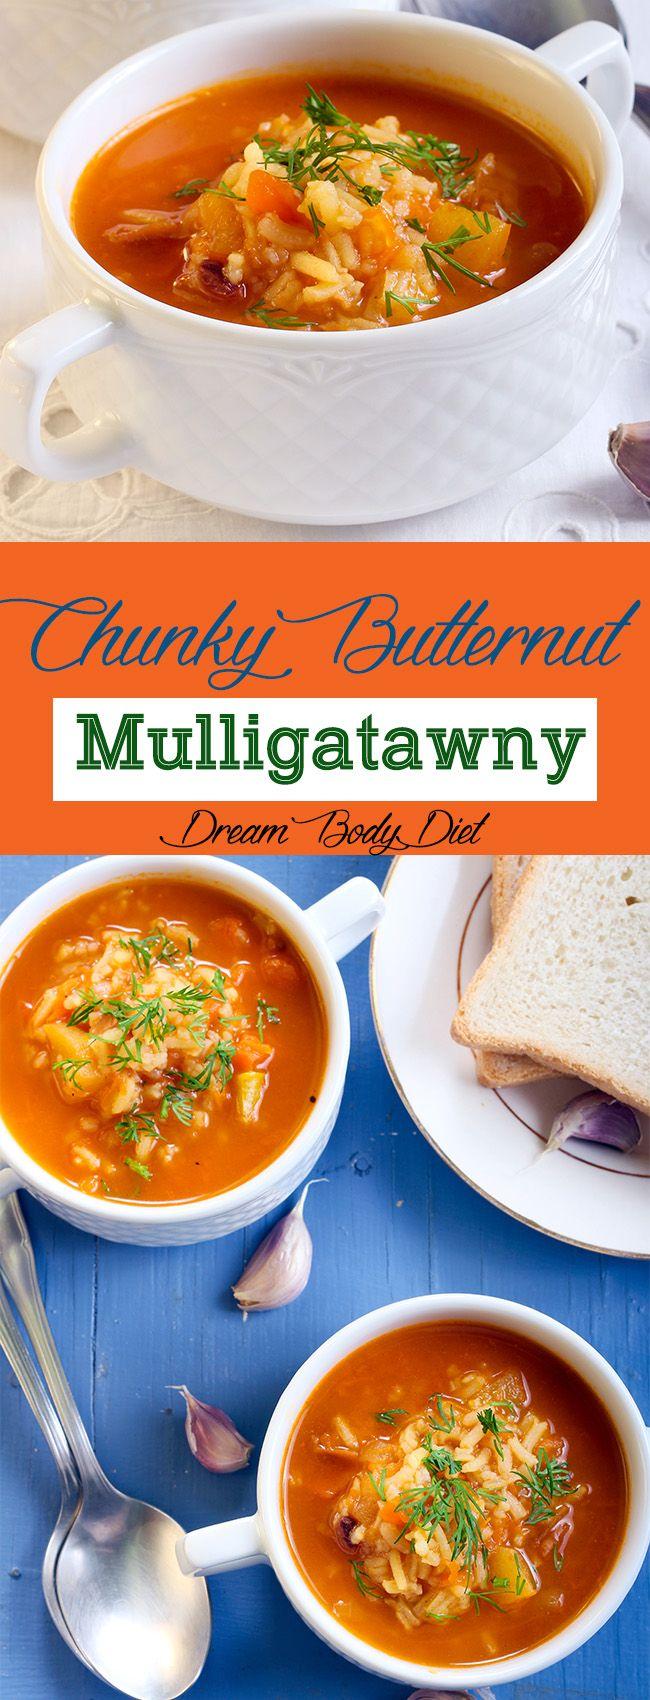 Chunky Butternut Mulligatawny - Sueño Cuerpo Dieta - Dieta cuerpo de sueño